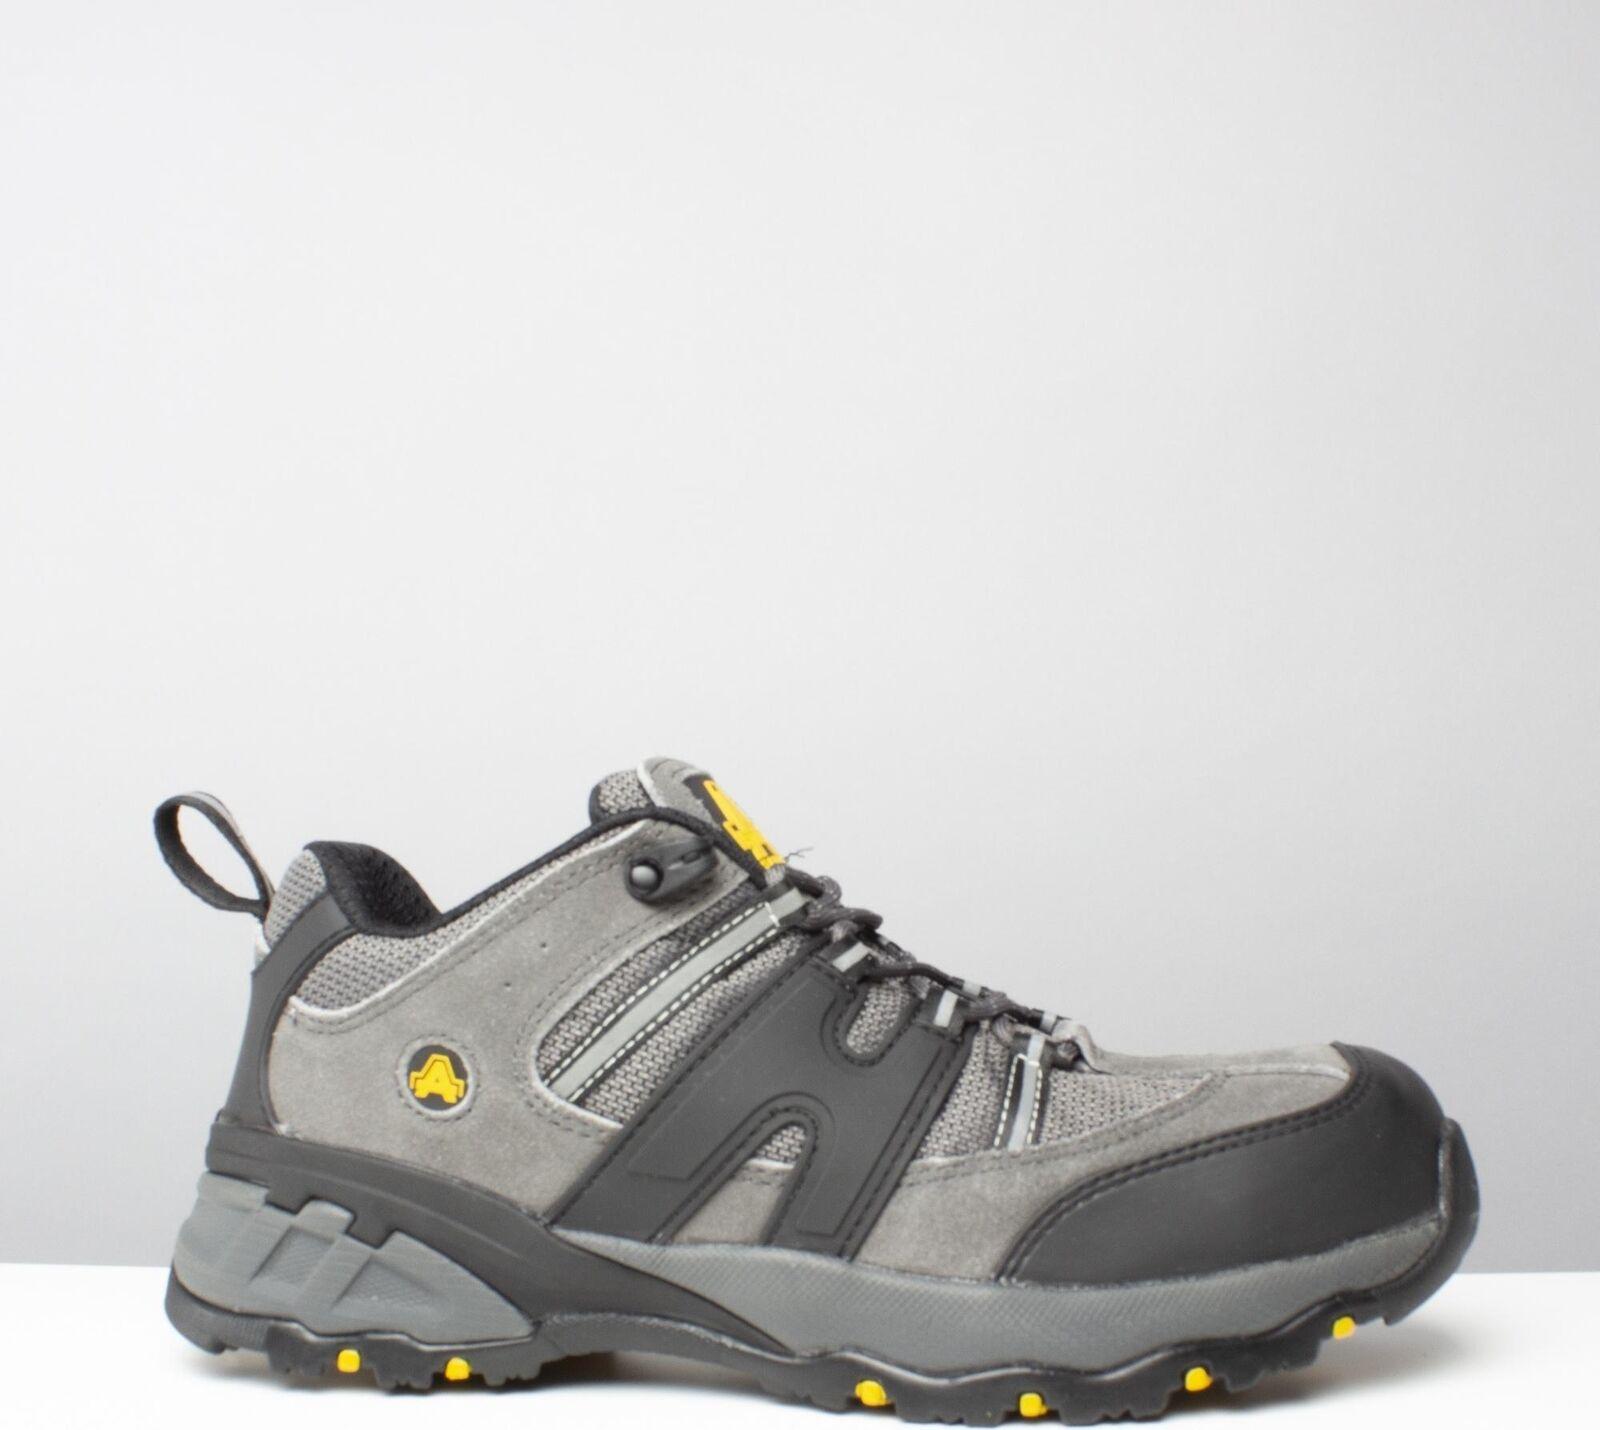 Amblers Safety FS188N Mens Steel Toe Cap Slip Resistant SB Safety Trainers grau